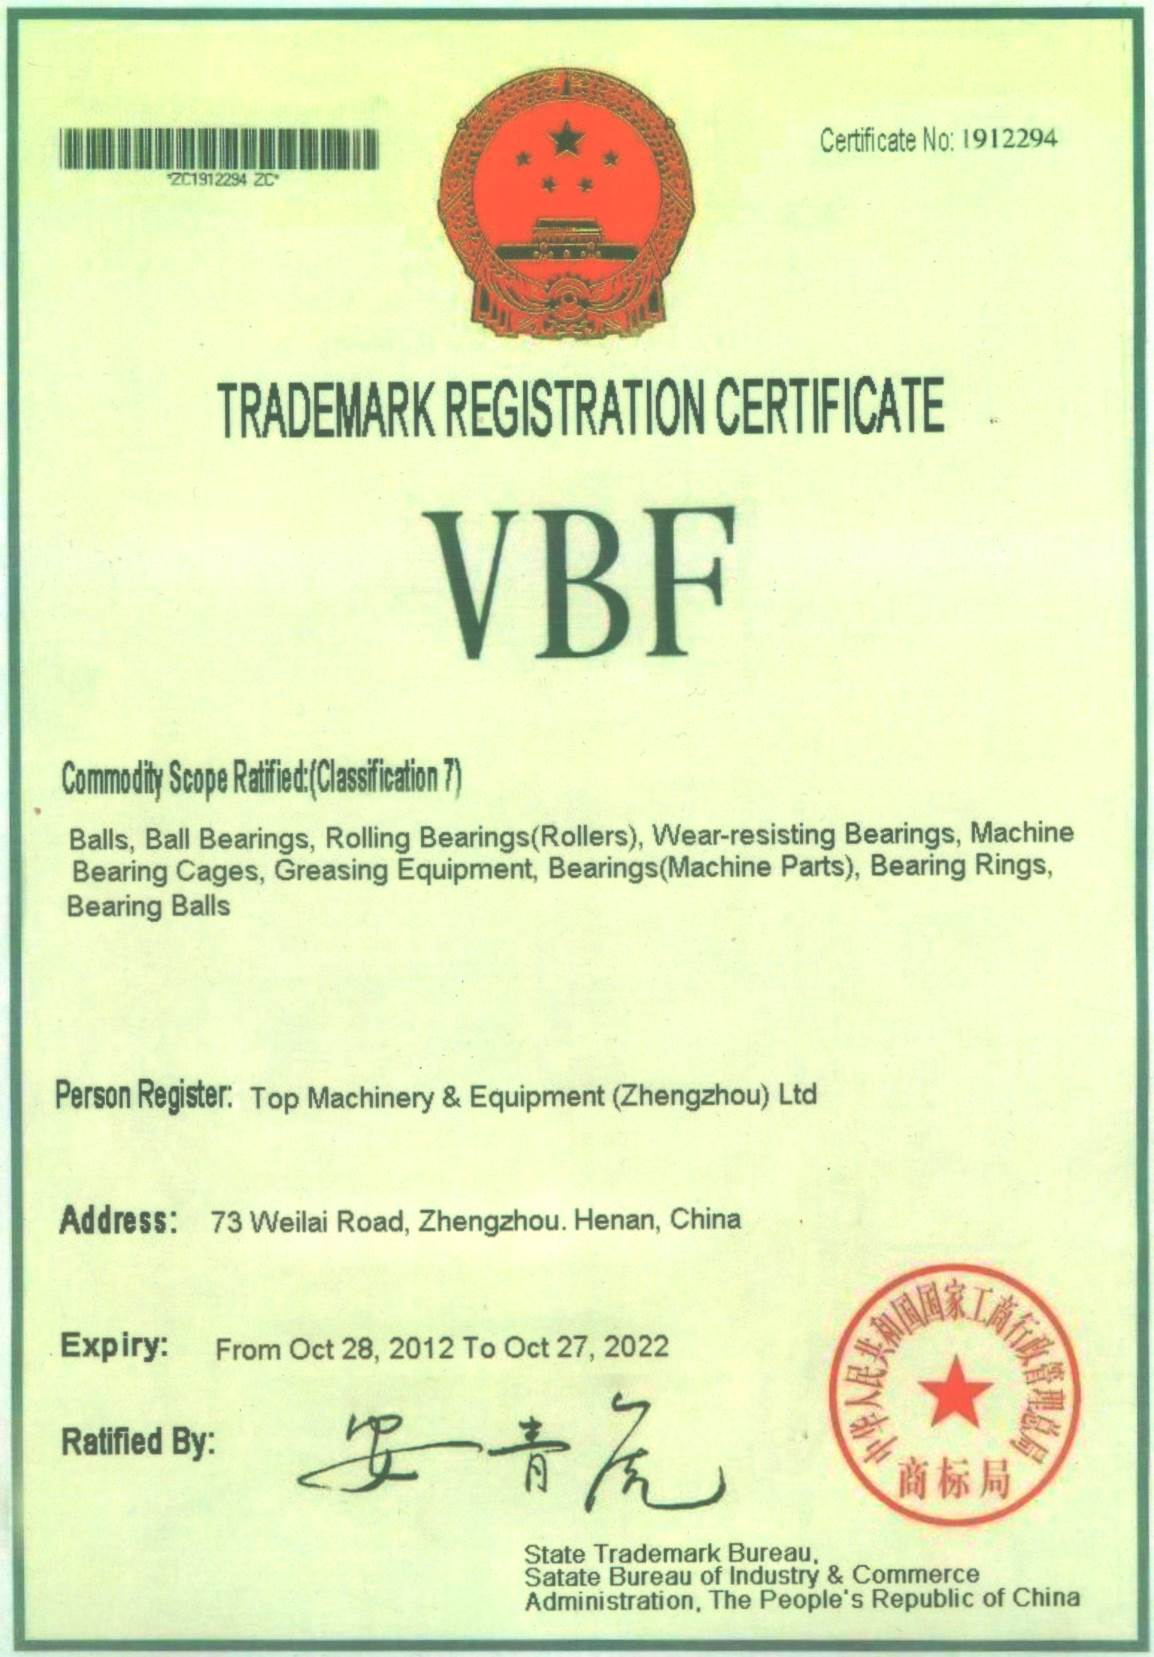 Trademark registration certificate VBF